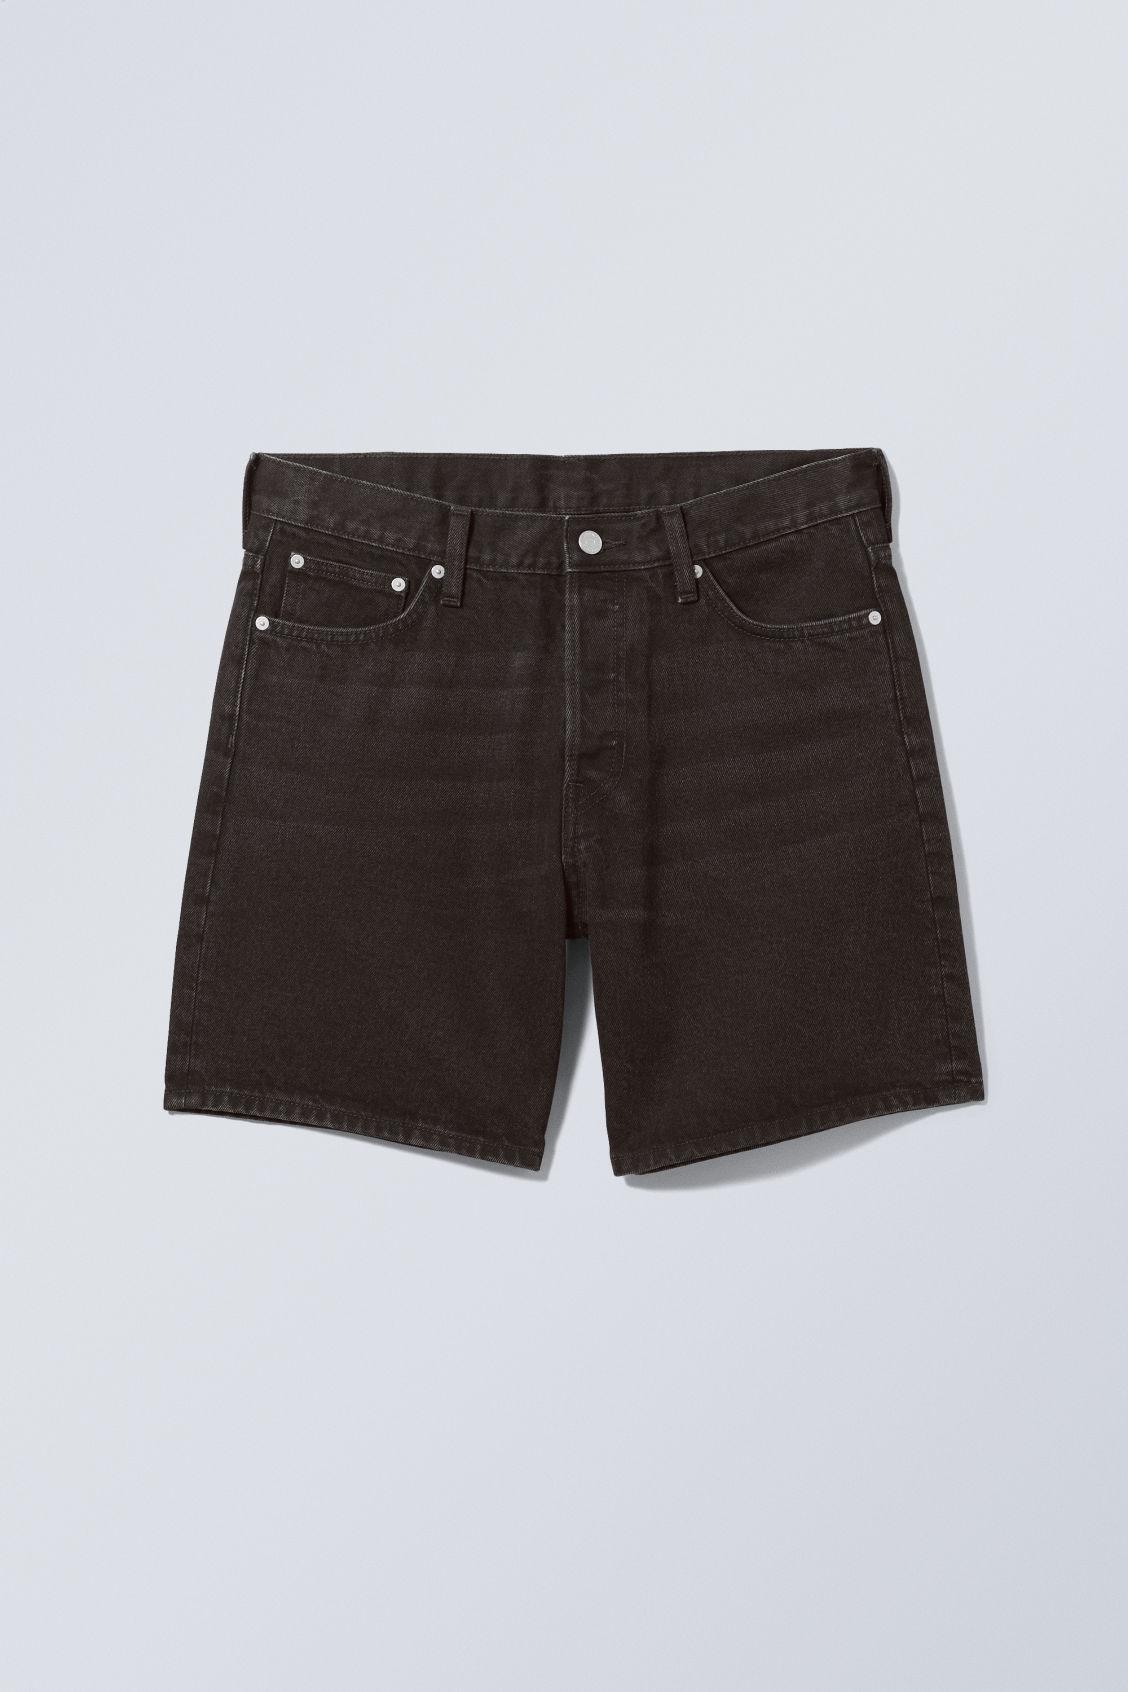 Vacant Denim Shorts - Black